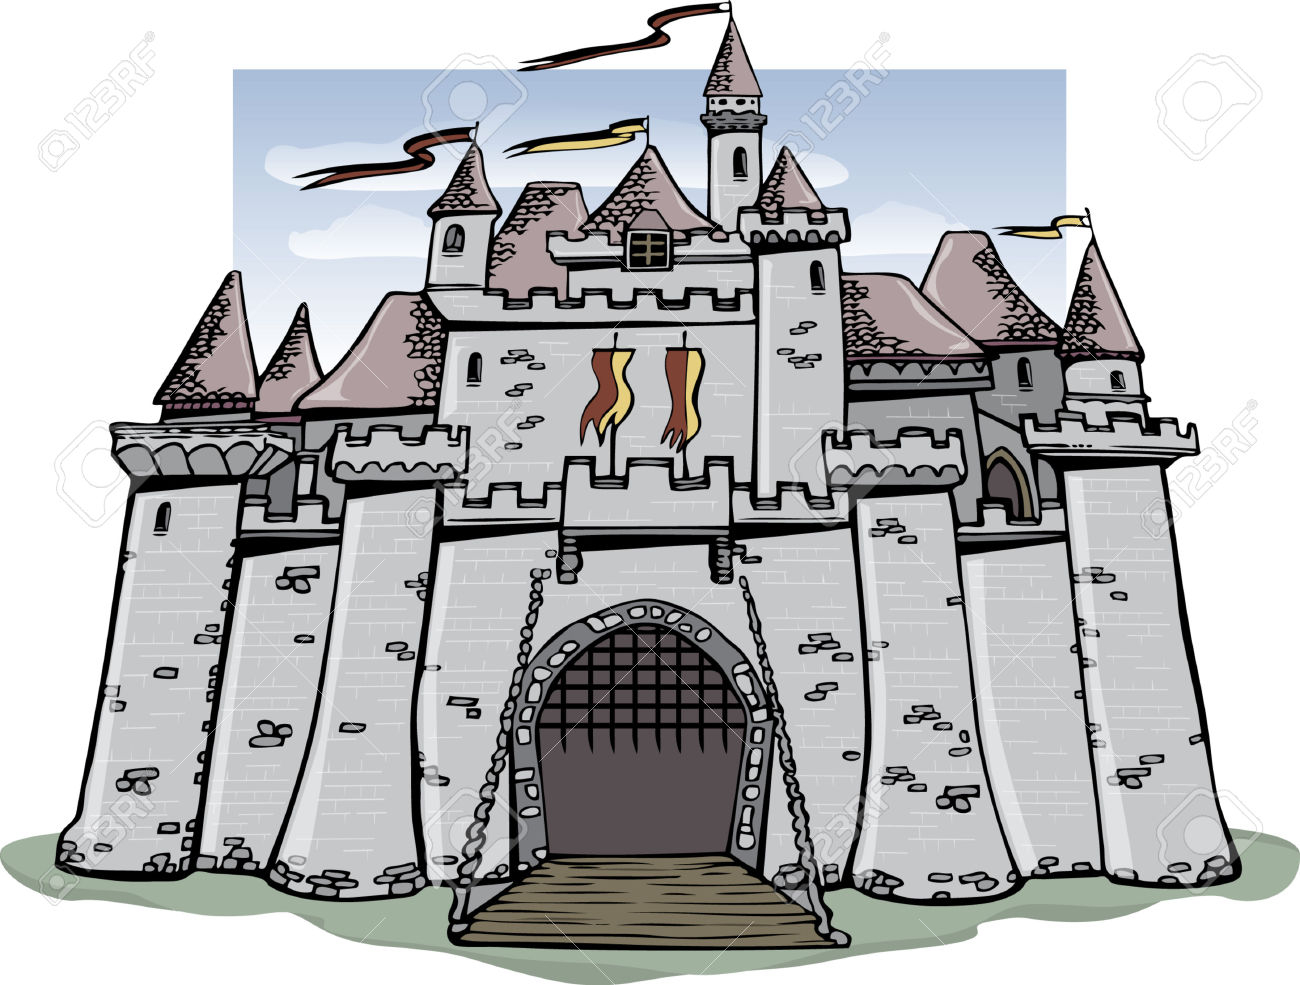 Clipart castle medieval. Free download clip